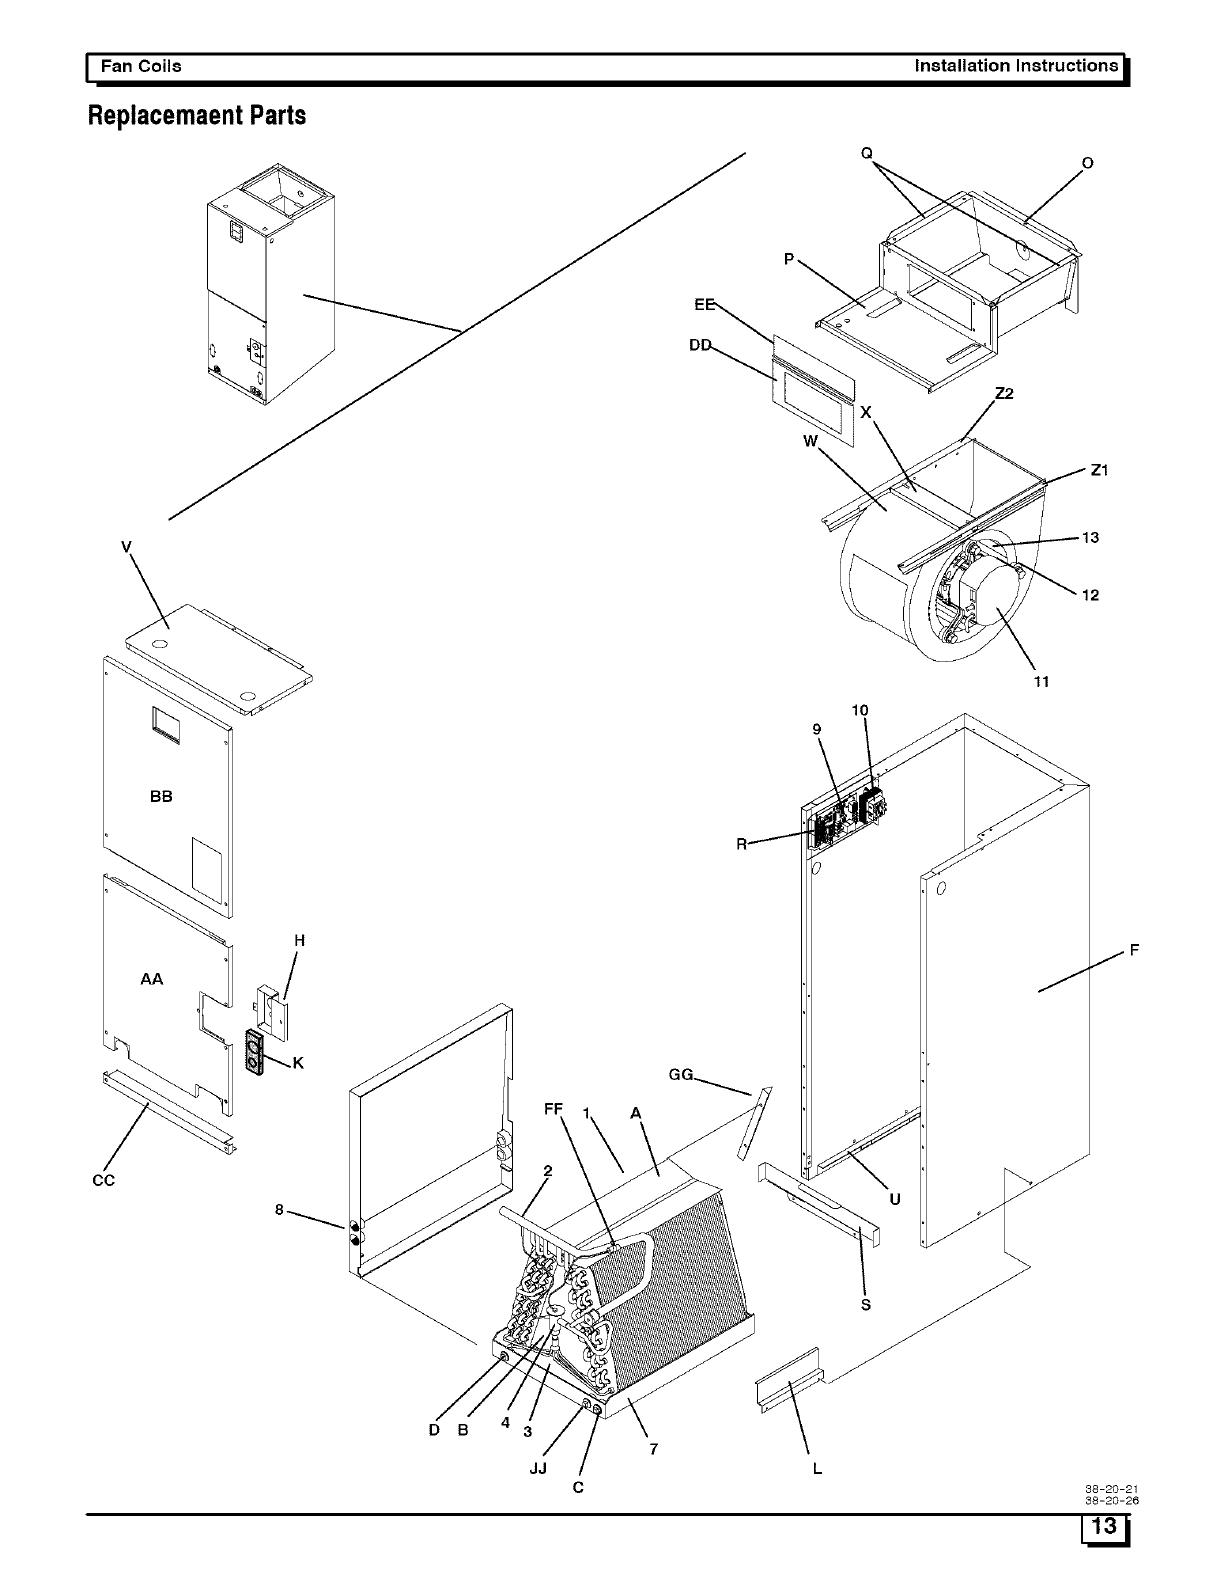 I fan coils installation instructions